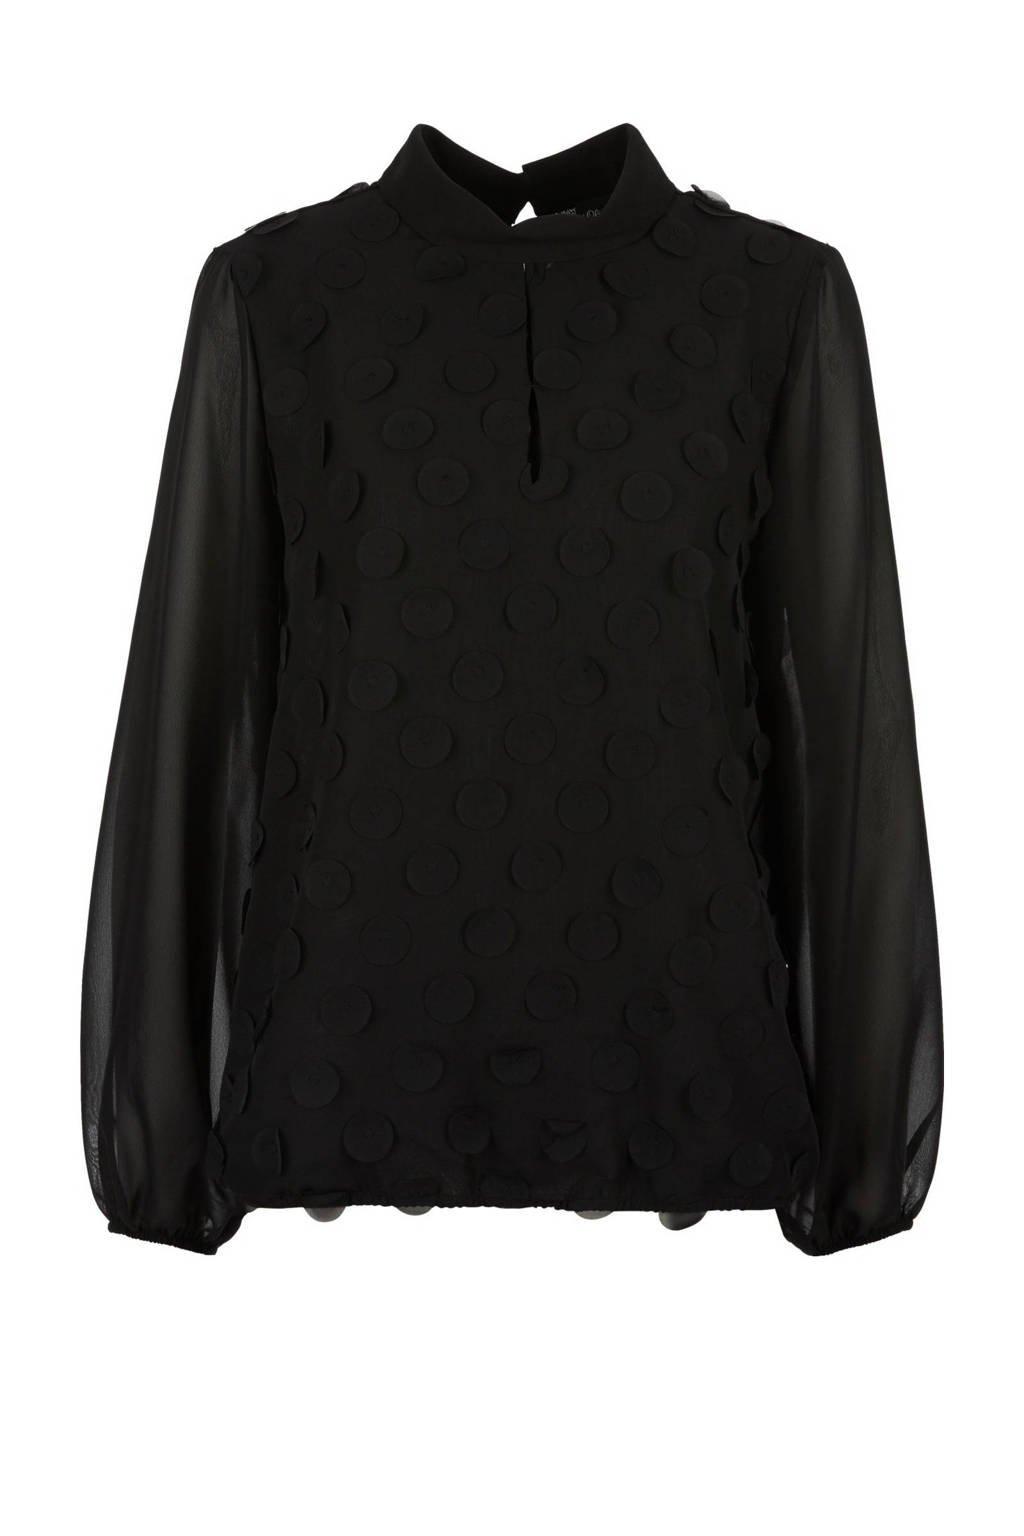 s.Oliver BLACK LABEL semi-transparante top met open detail zwart, Zwart